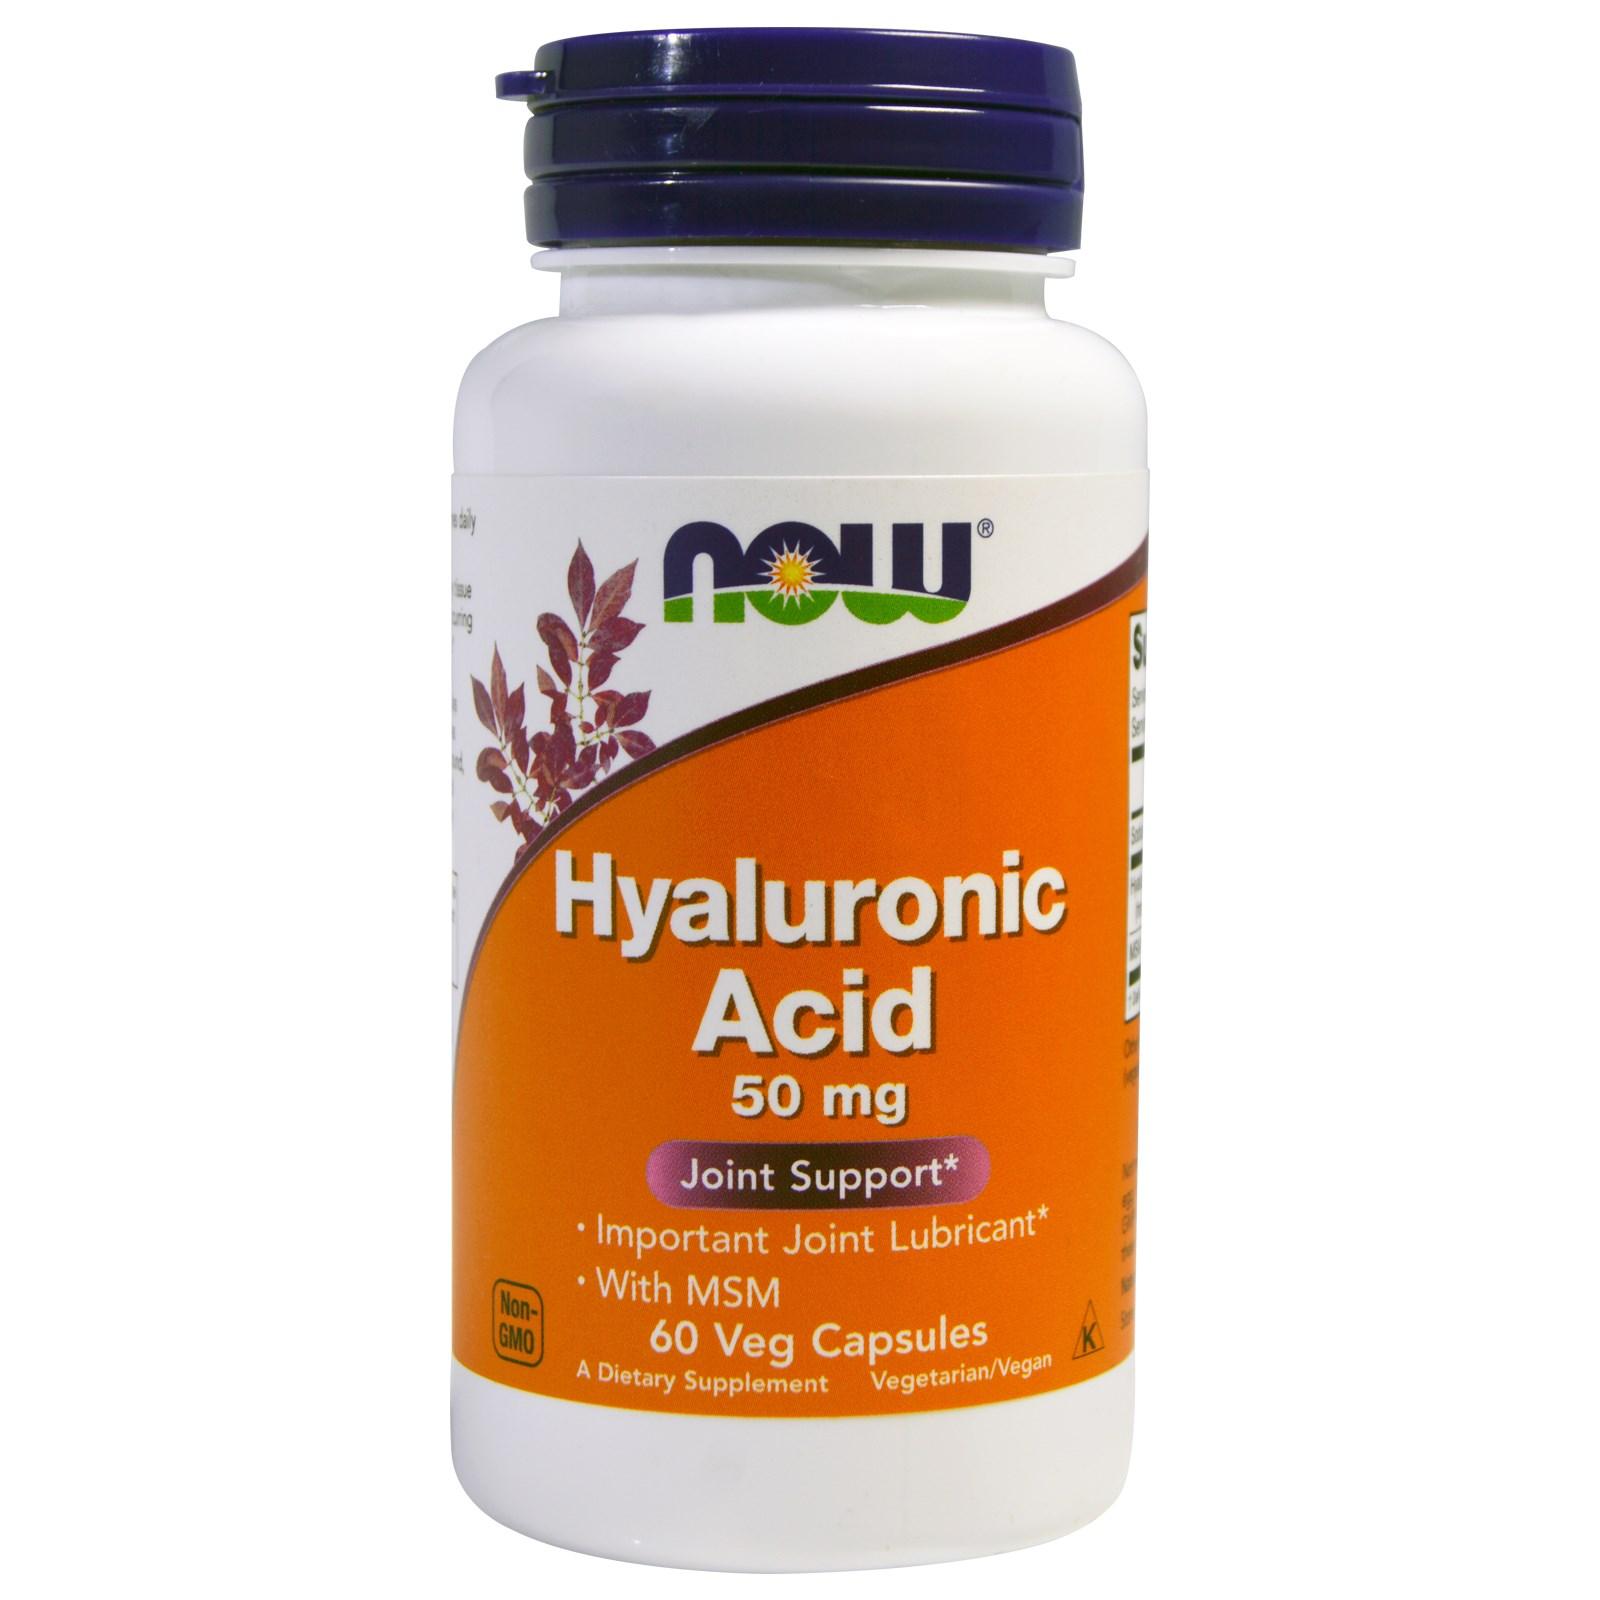 Image of Hyaluronic Acid 50 mg (60 Veggie Caps) - Now Foods 0733739031563